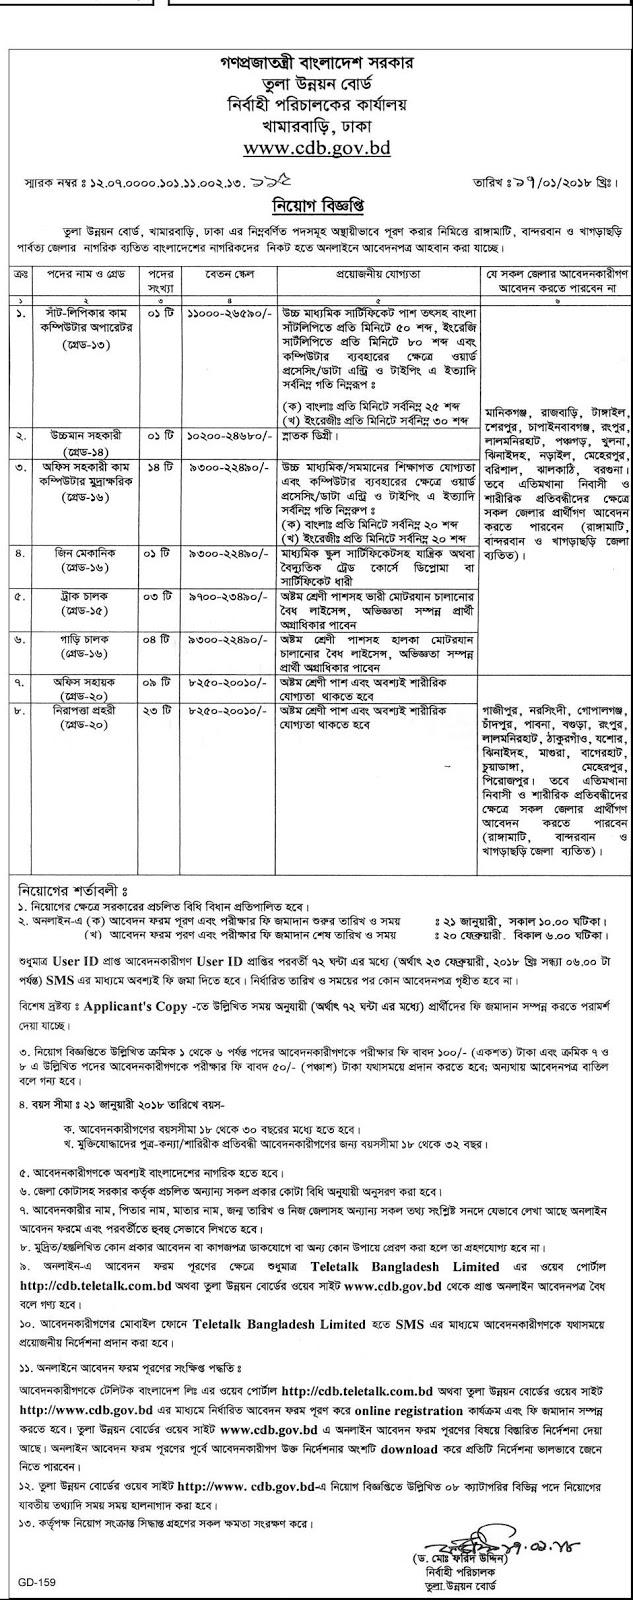 CDB - Cotton Development Board Limited Job Circular 2018